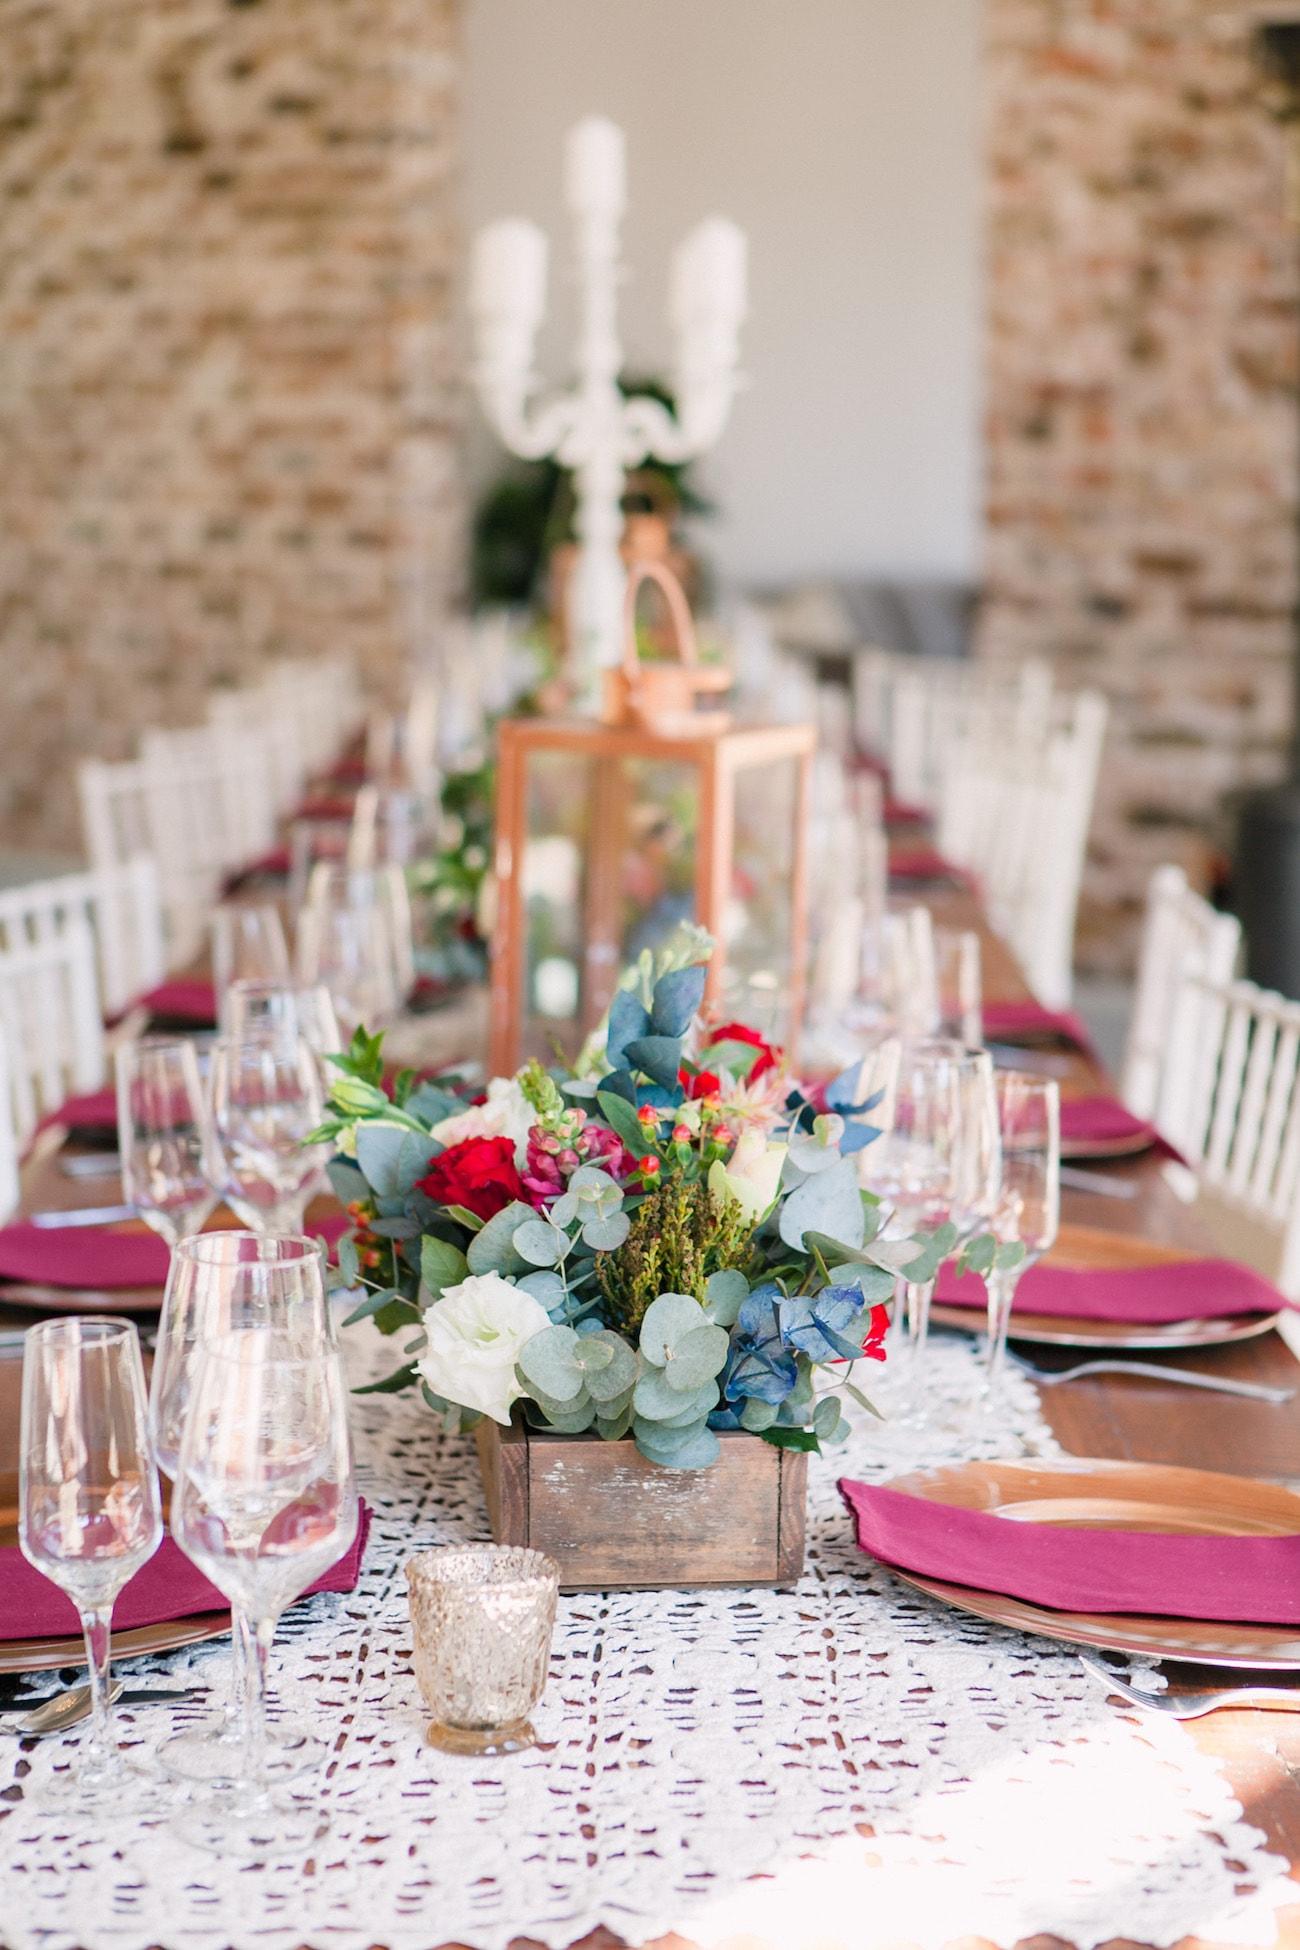 Jewel Tone Table Decor | Joyous Jewel Tone Winter Wedding | Credit: Dust and Dreams Photography